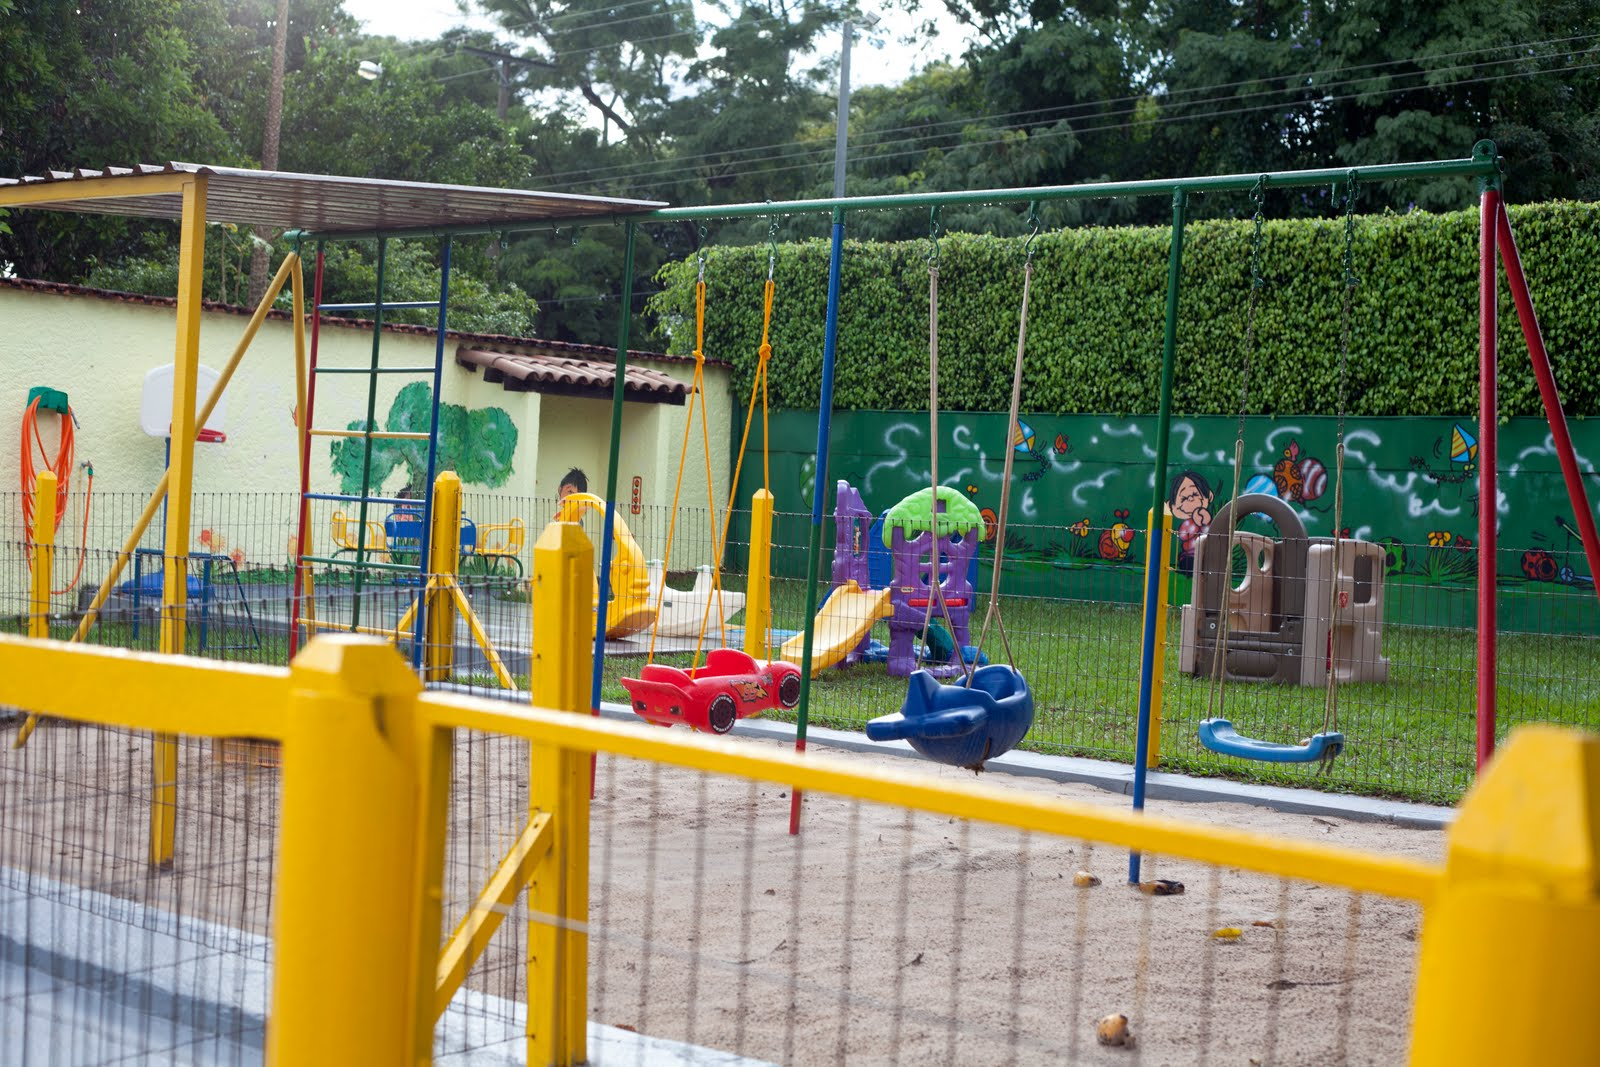 Preschool Playground Clipart Clipart Suggest